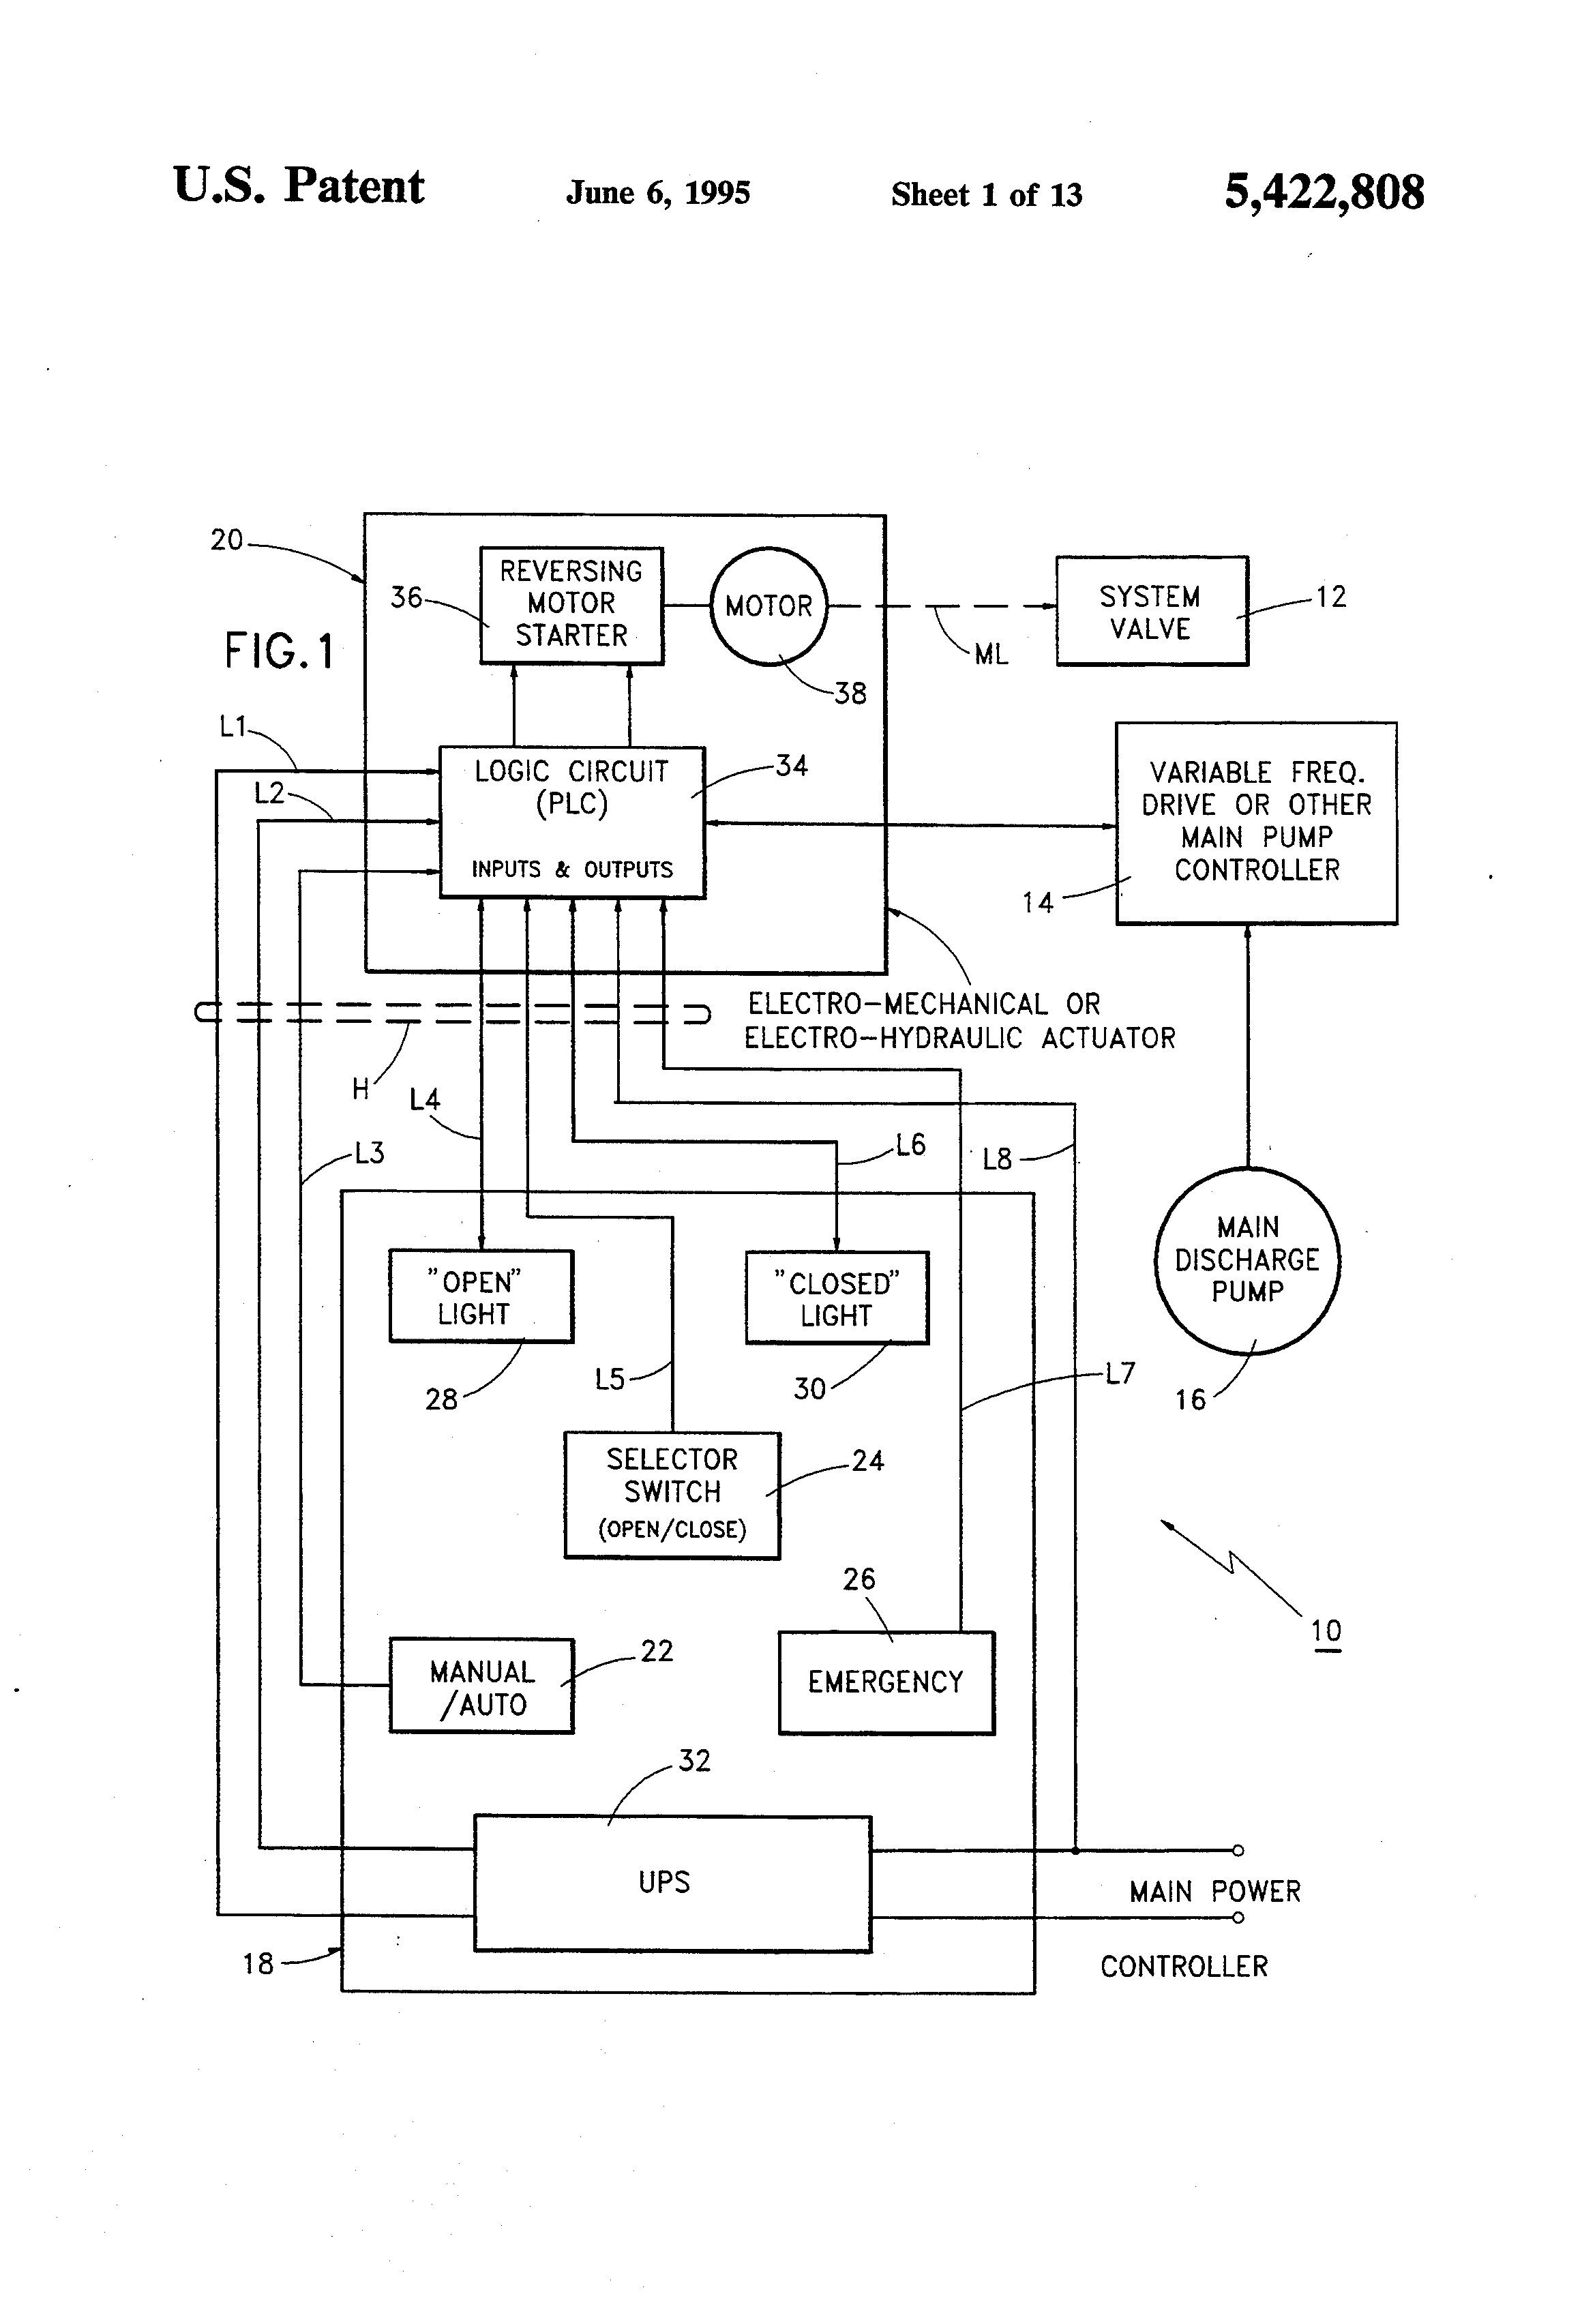 New Wiring Diagram Of Dol Motor Starter